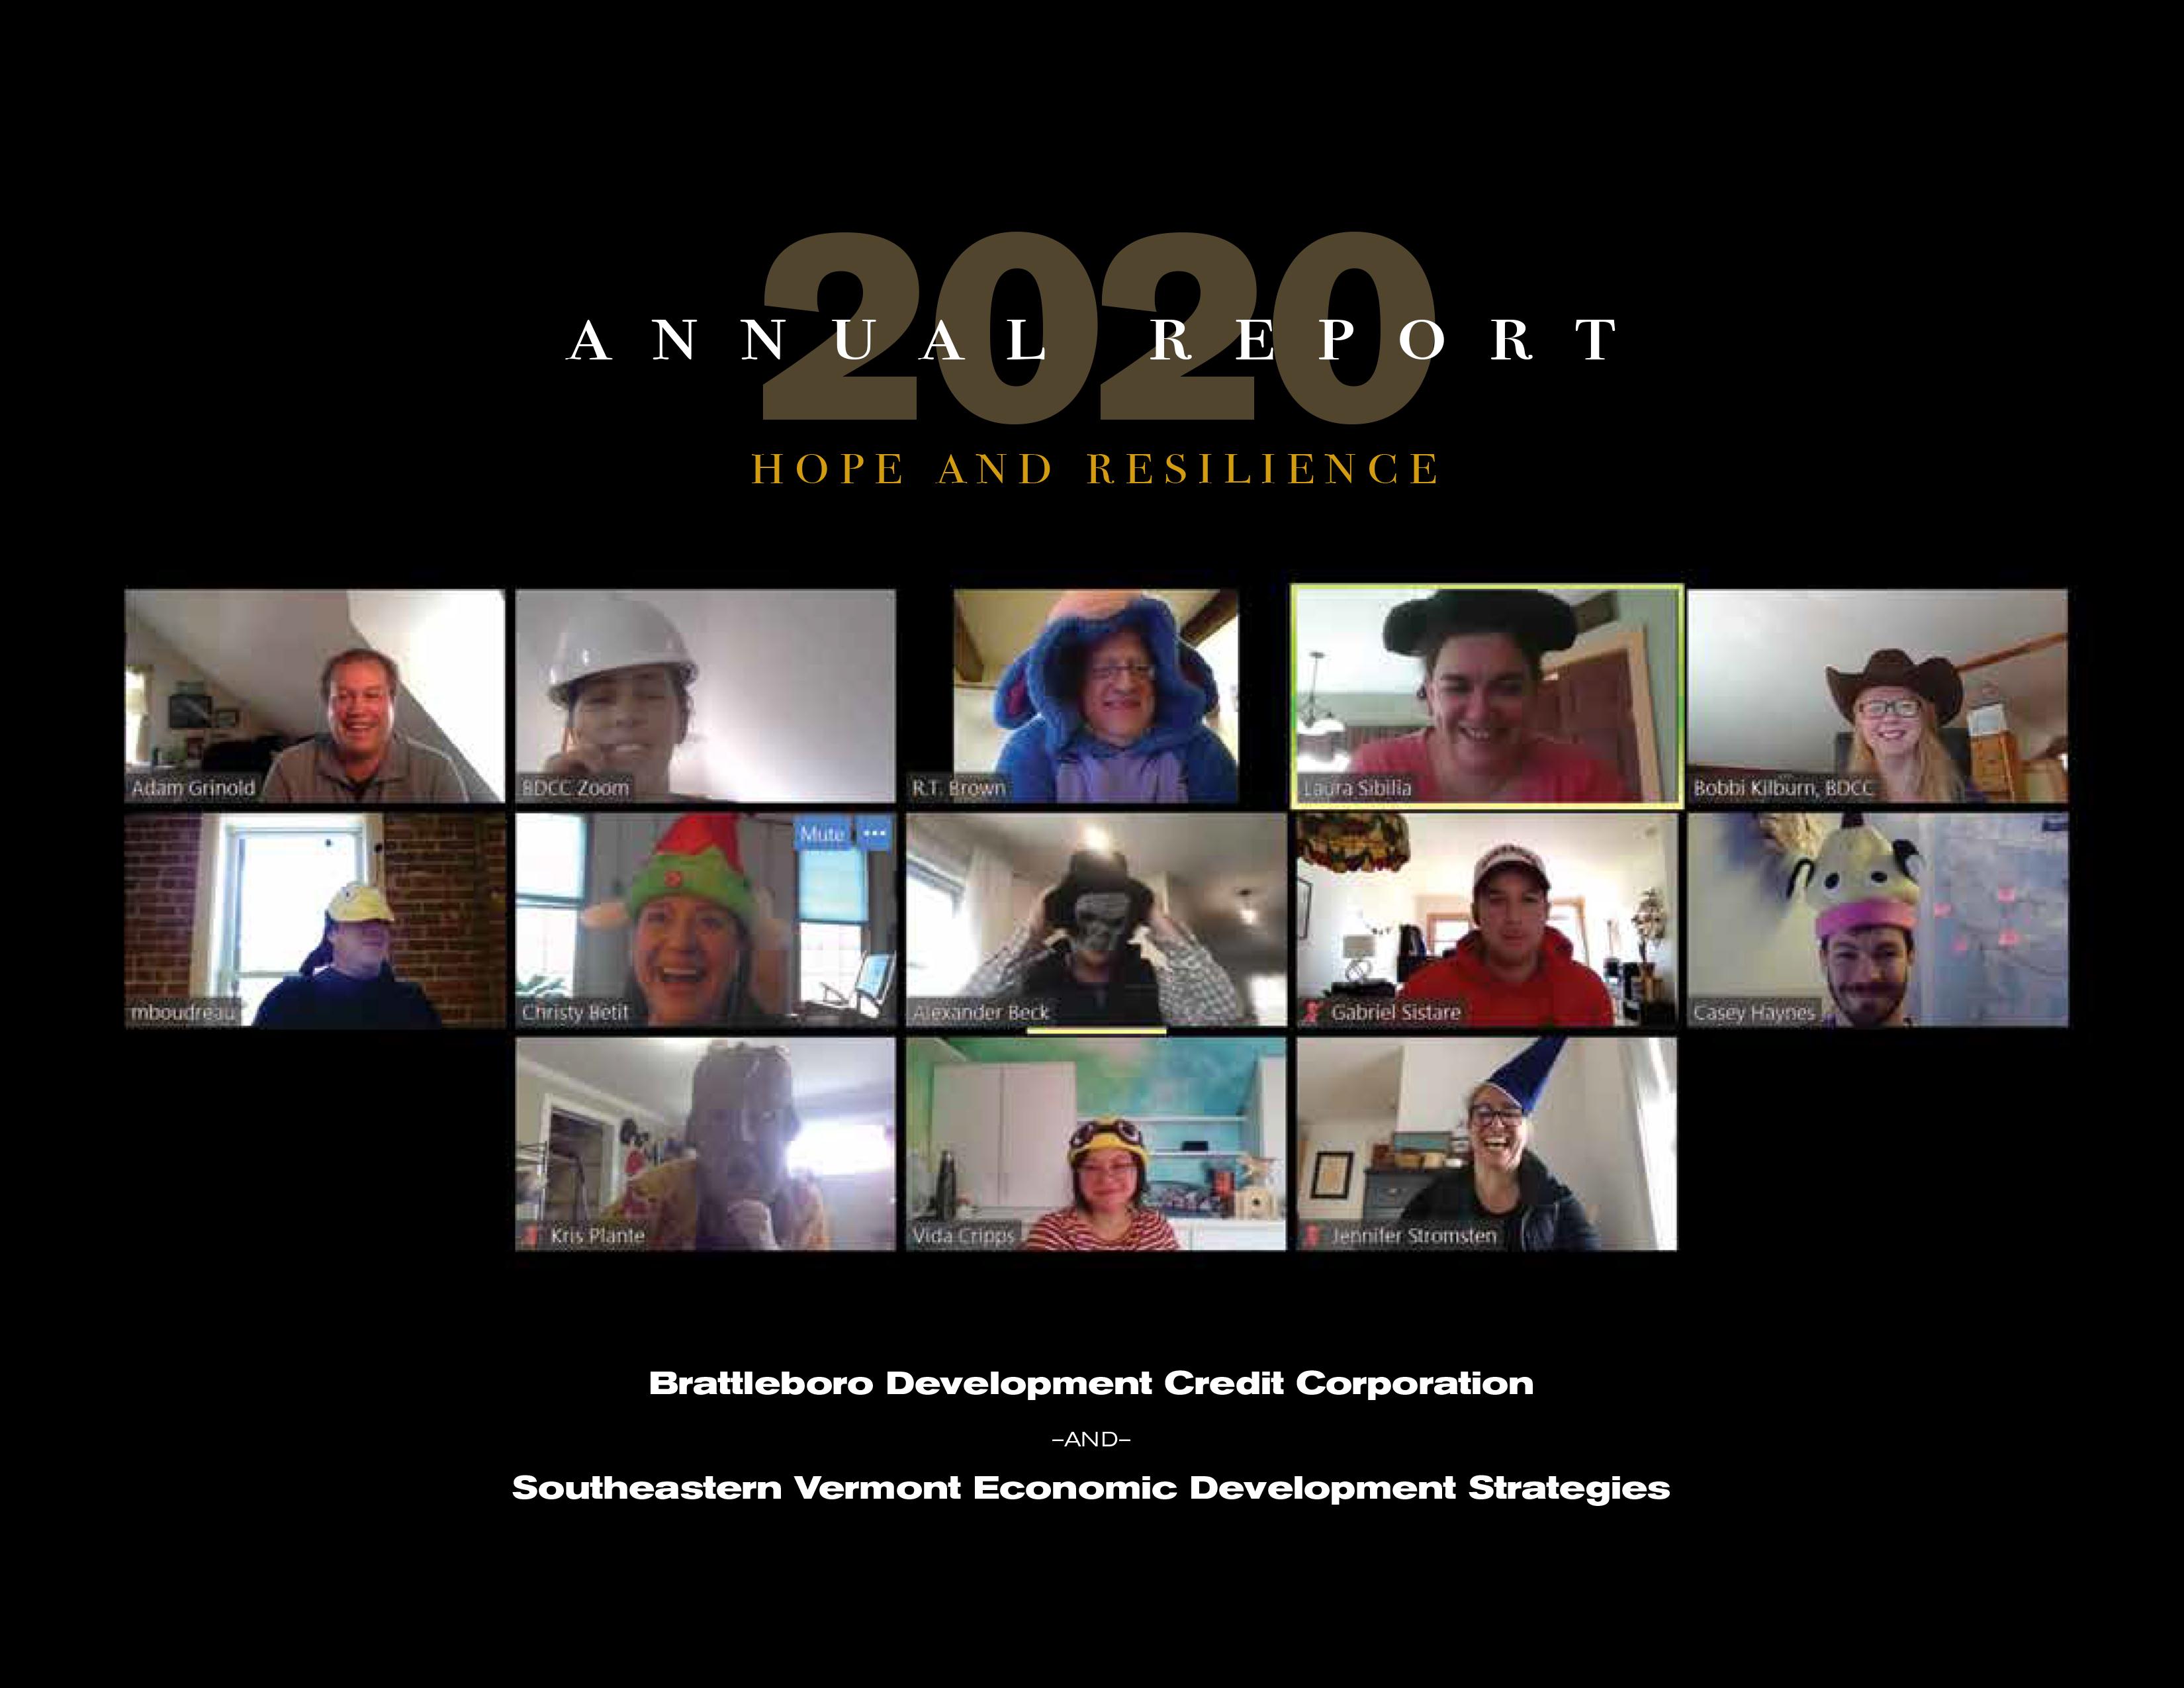 https://brattleborodevelopment.com/wp-content/uploads/2020/10/BDCCAnnualReport2020FINALweb-1.jpg